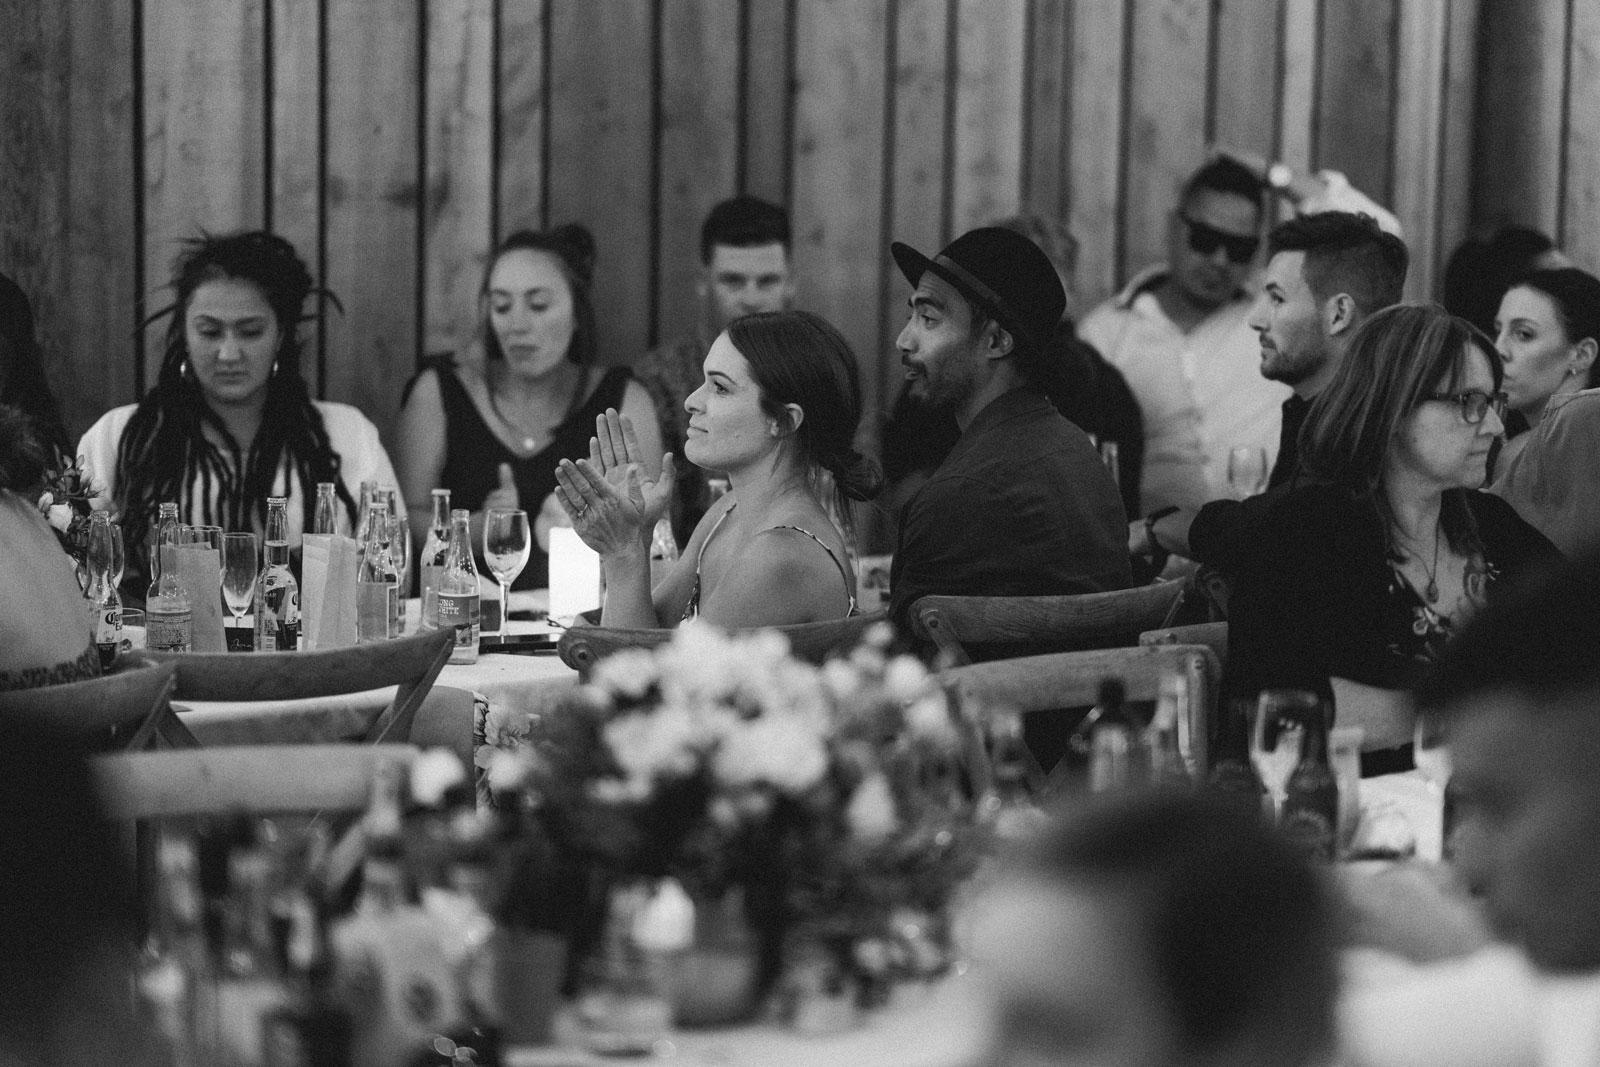 newfound-n-w-black-barn-tarawera-rotorua-wedding-photographer-992